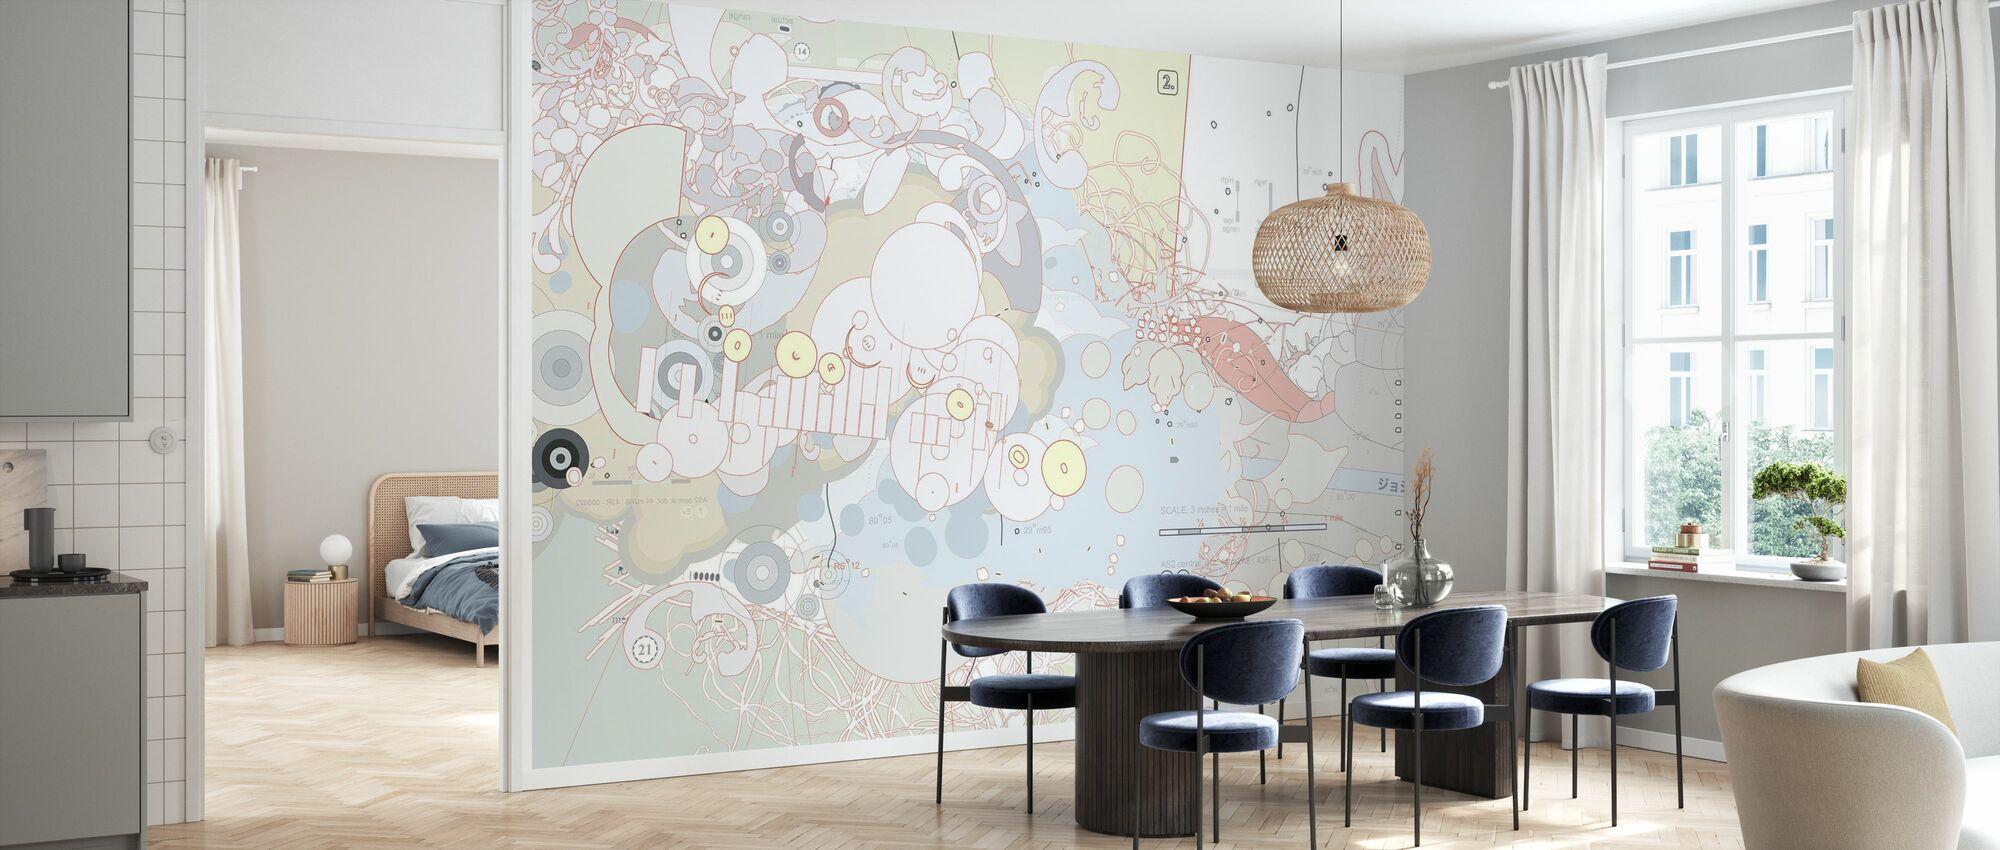 Joshua Davis - Ouaf - Wallpaper - Kitchen